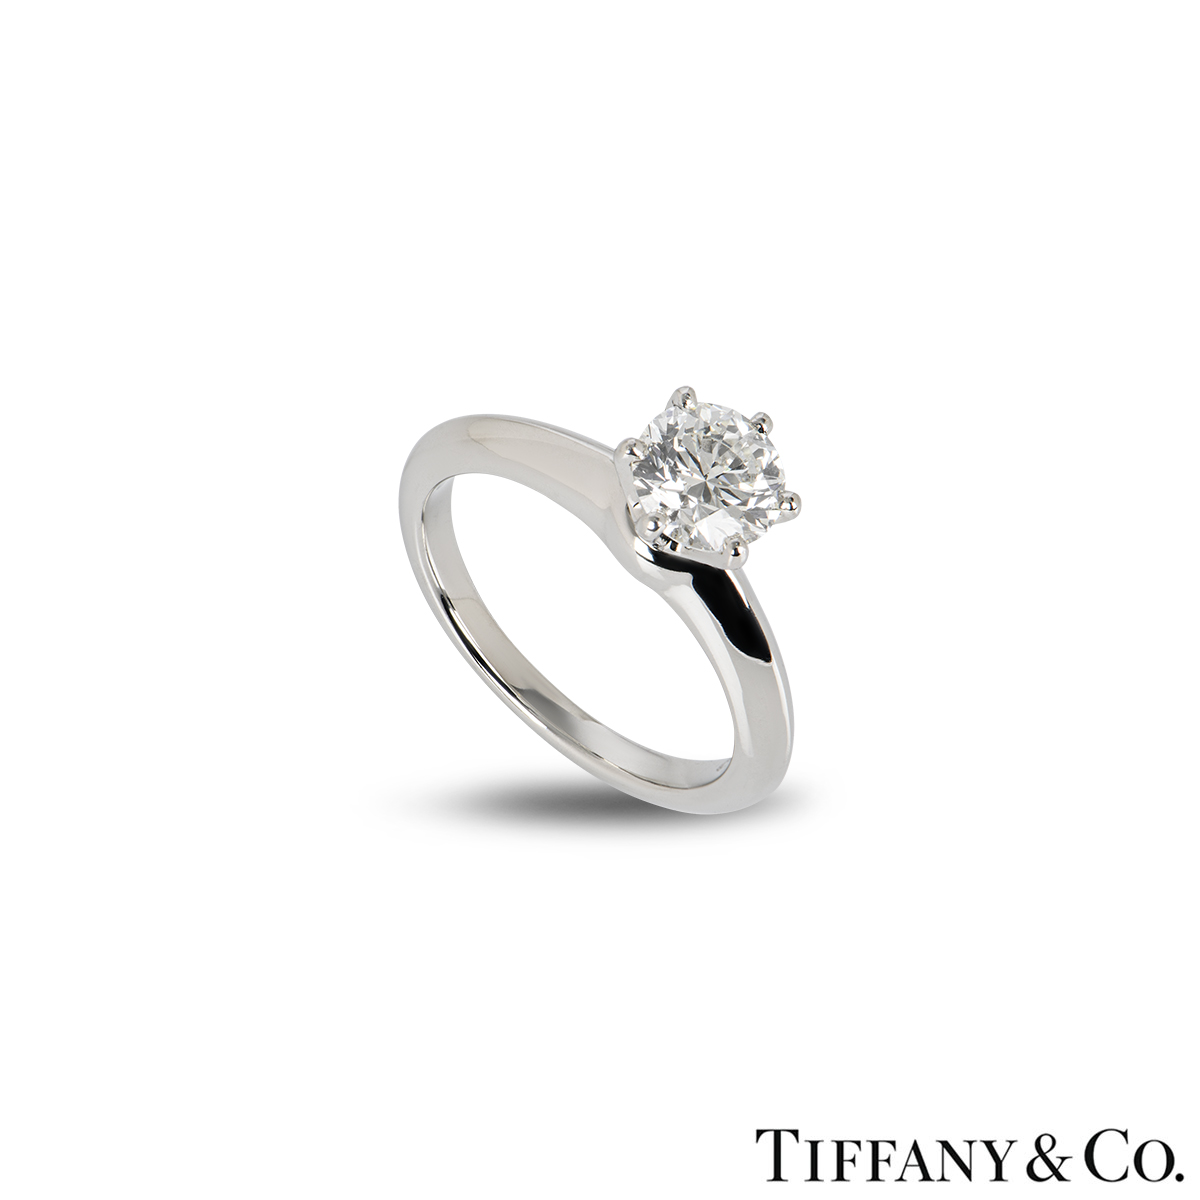 Tiffany & Co. The Tiffany Setting Diamond Ring 1.00ct H/VVS1 XXX